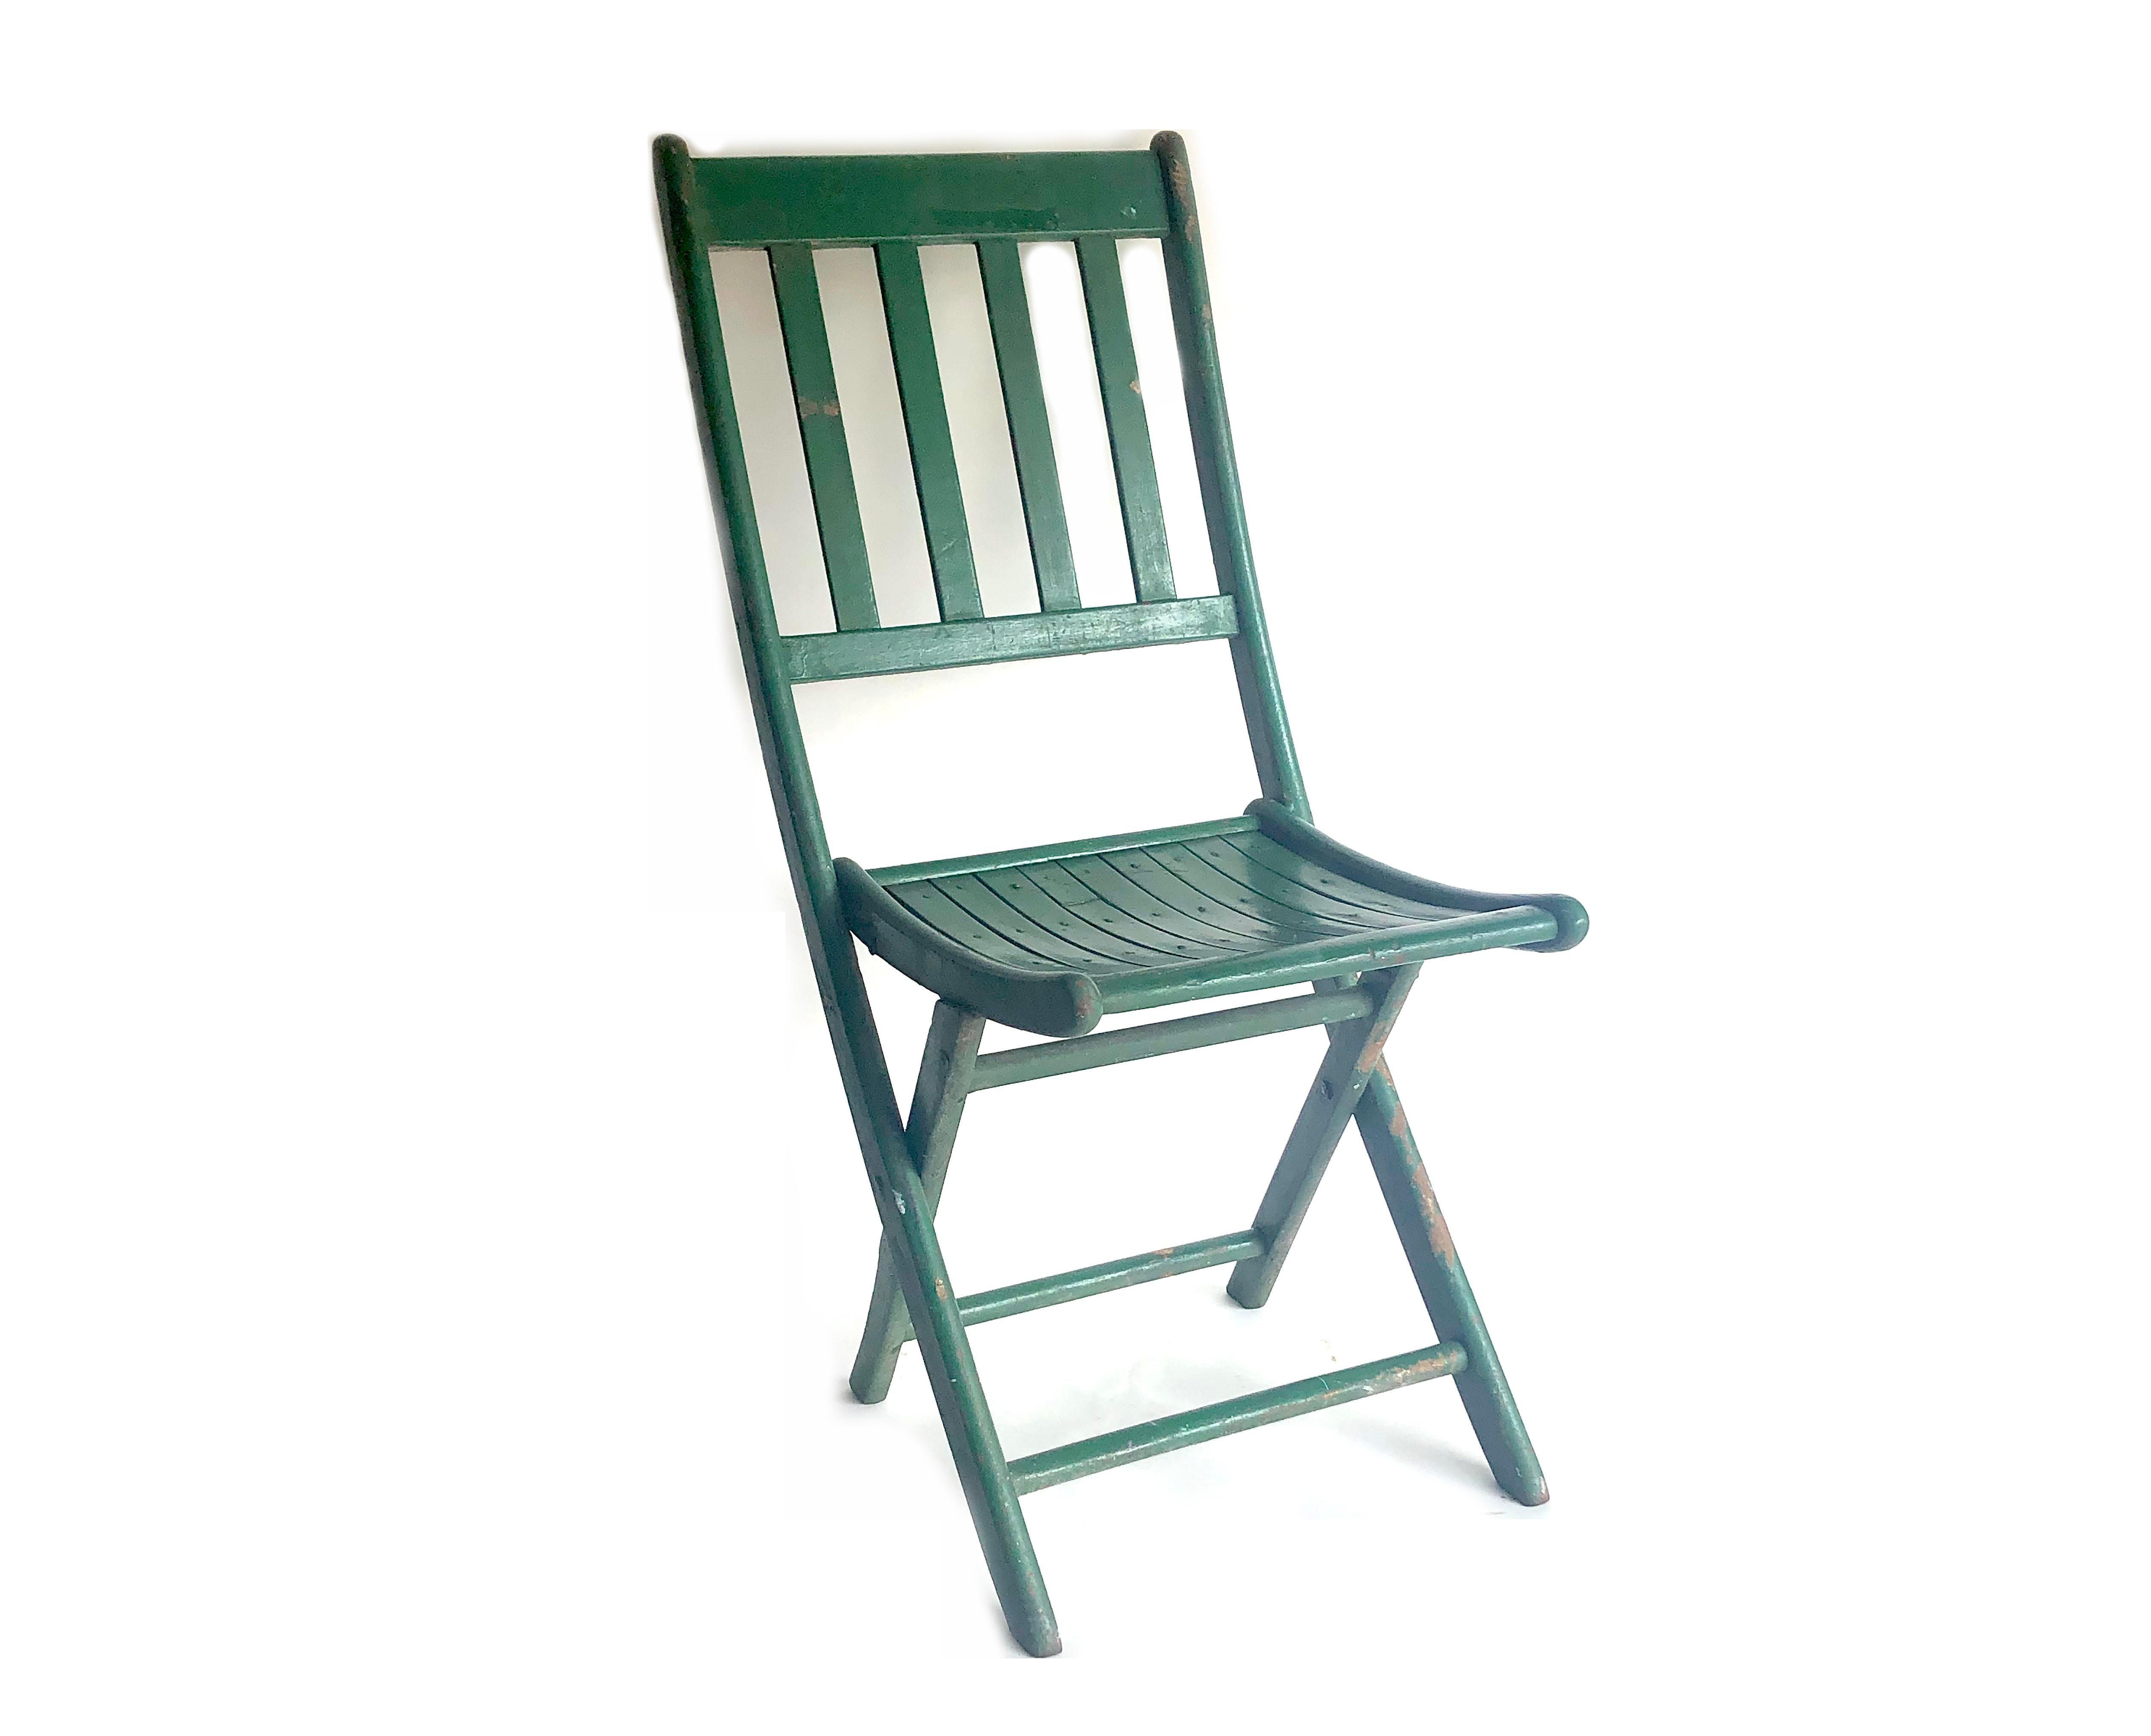 1950s Vintage Green Wood Slat Seat Folding Chair